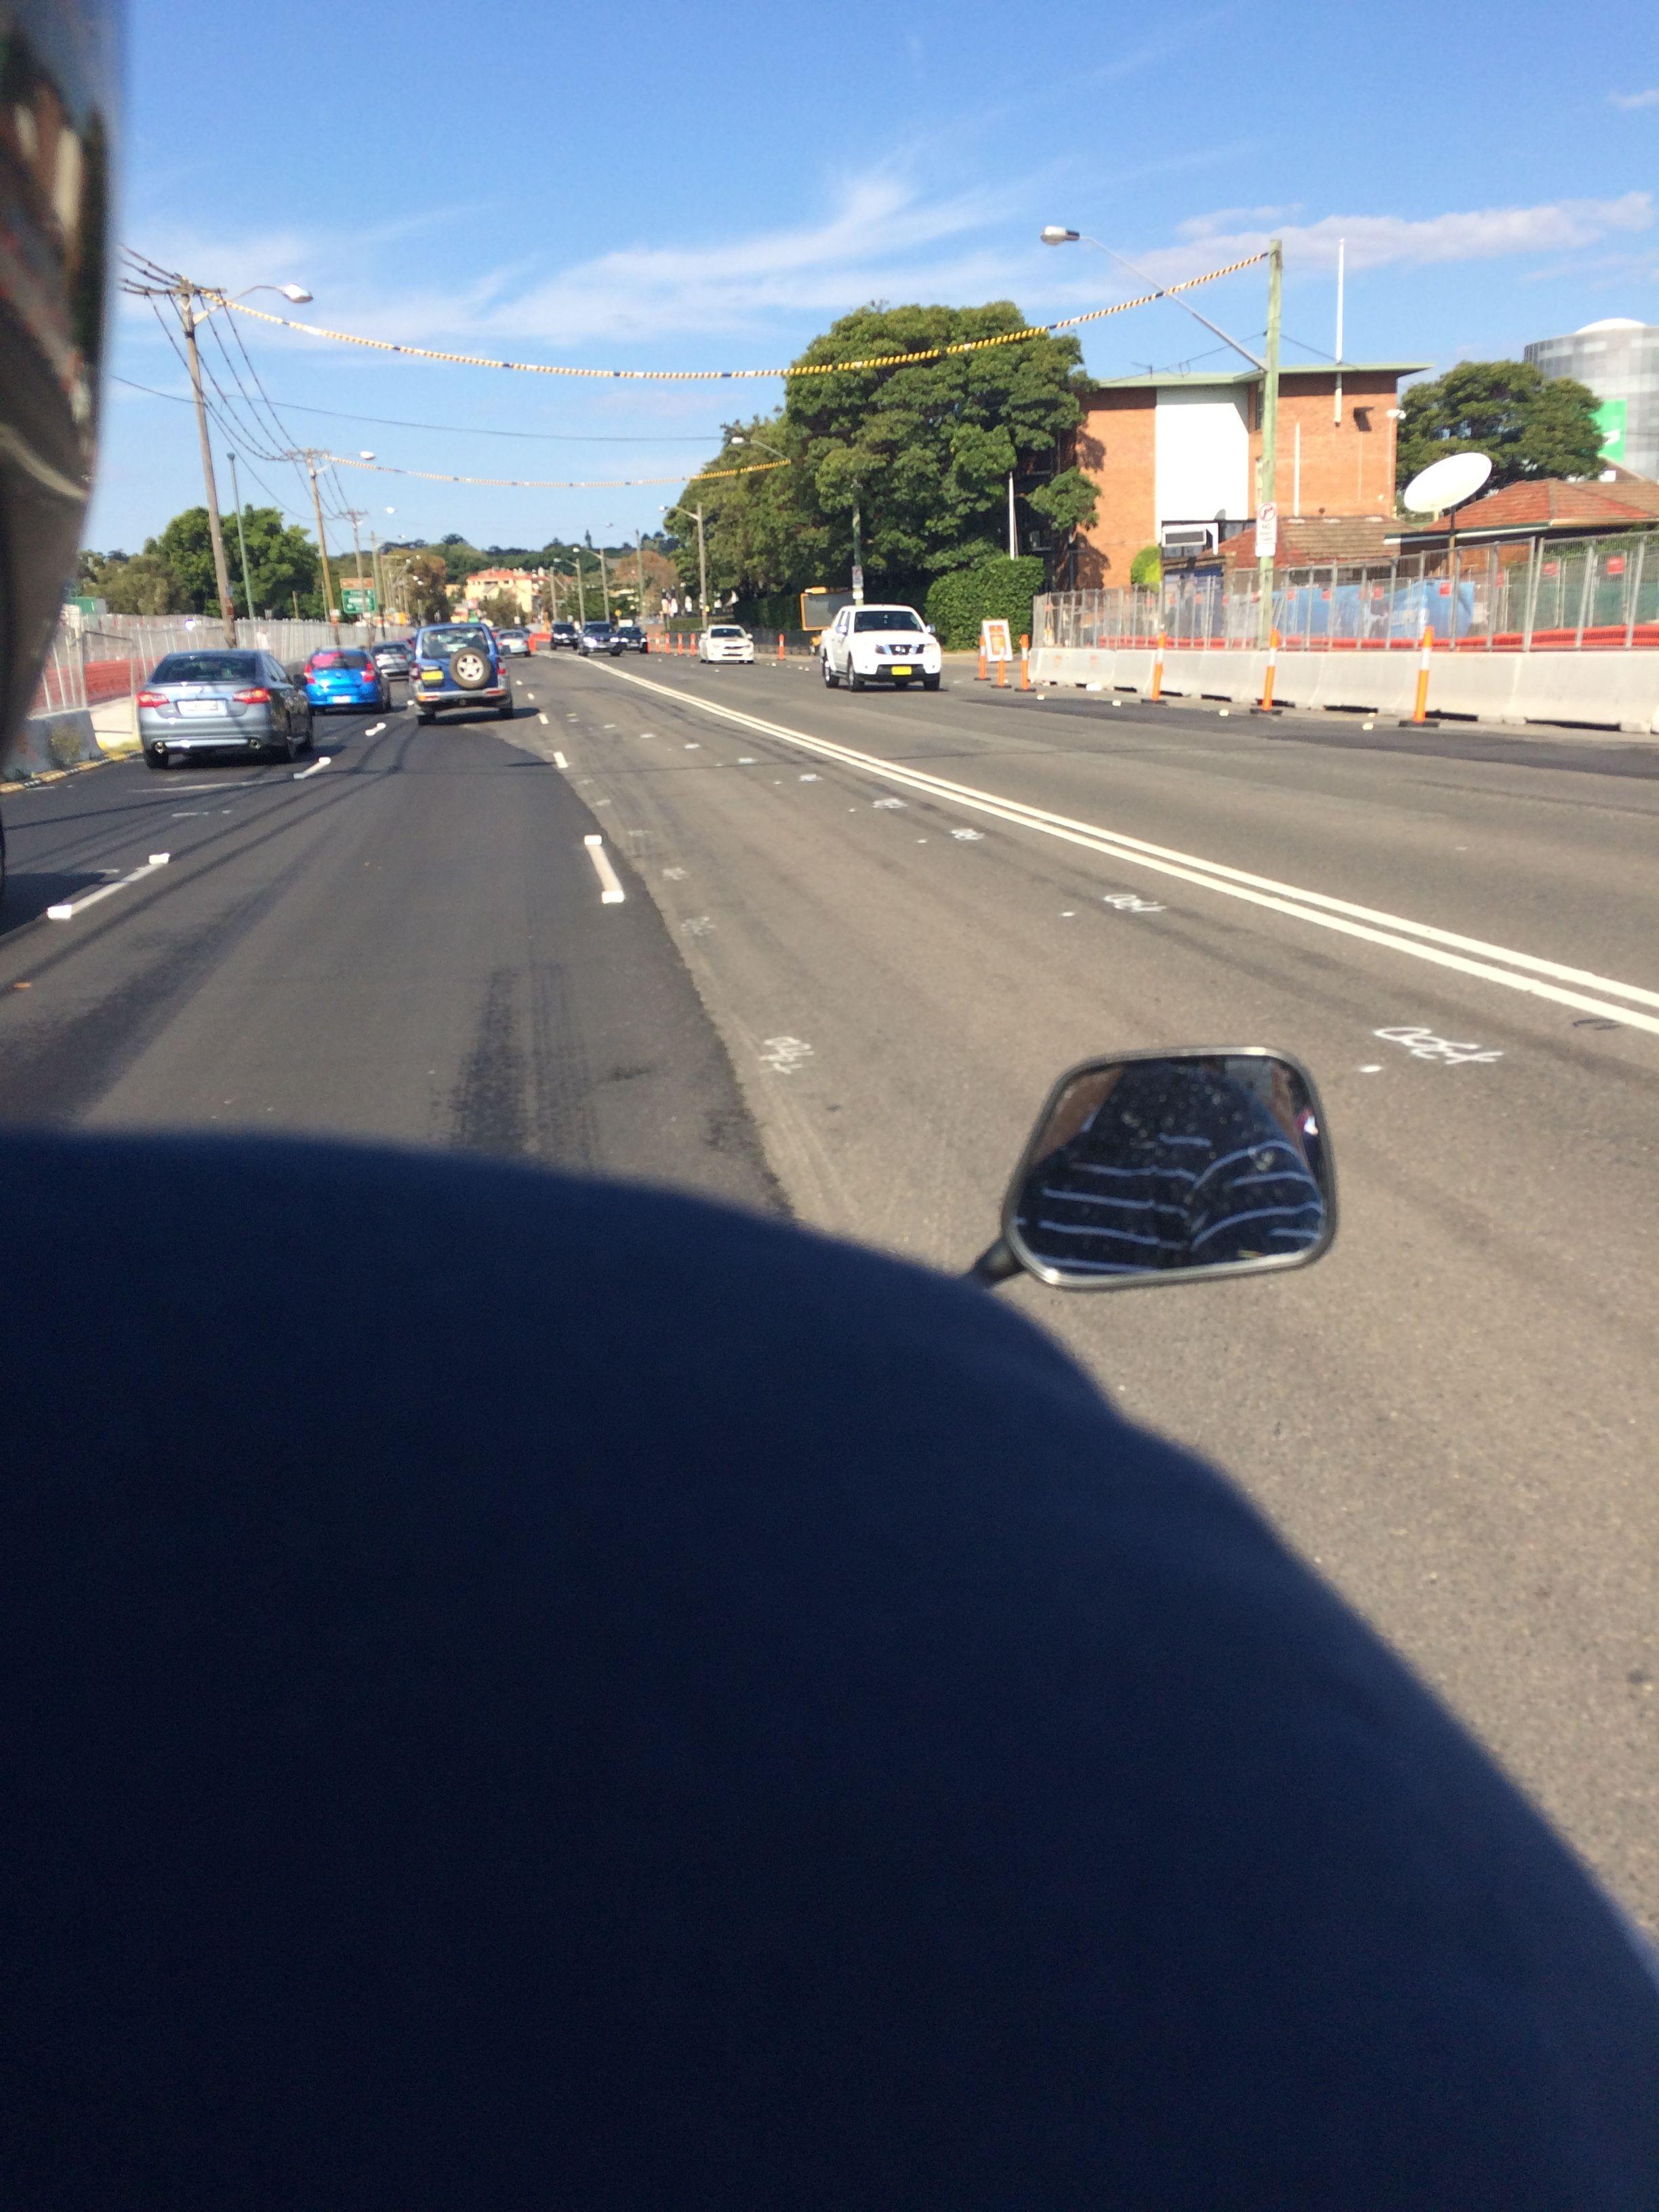 Motorbike Sydney - First Time